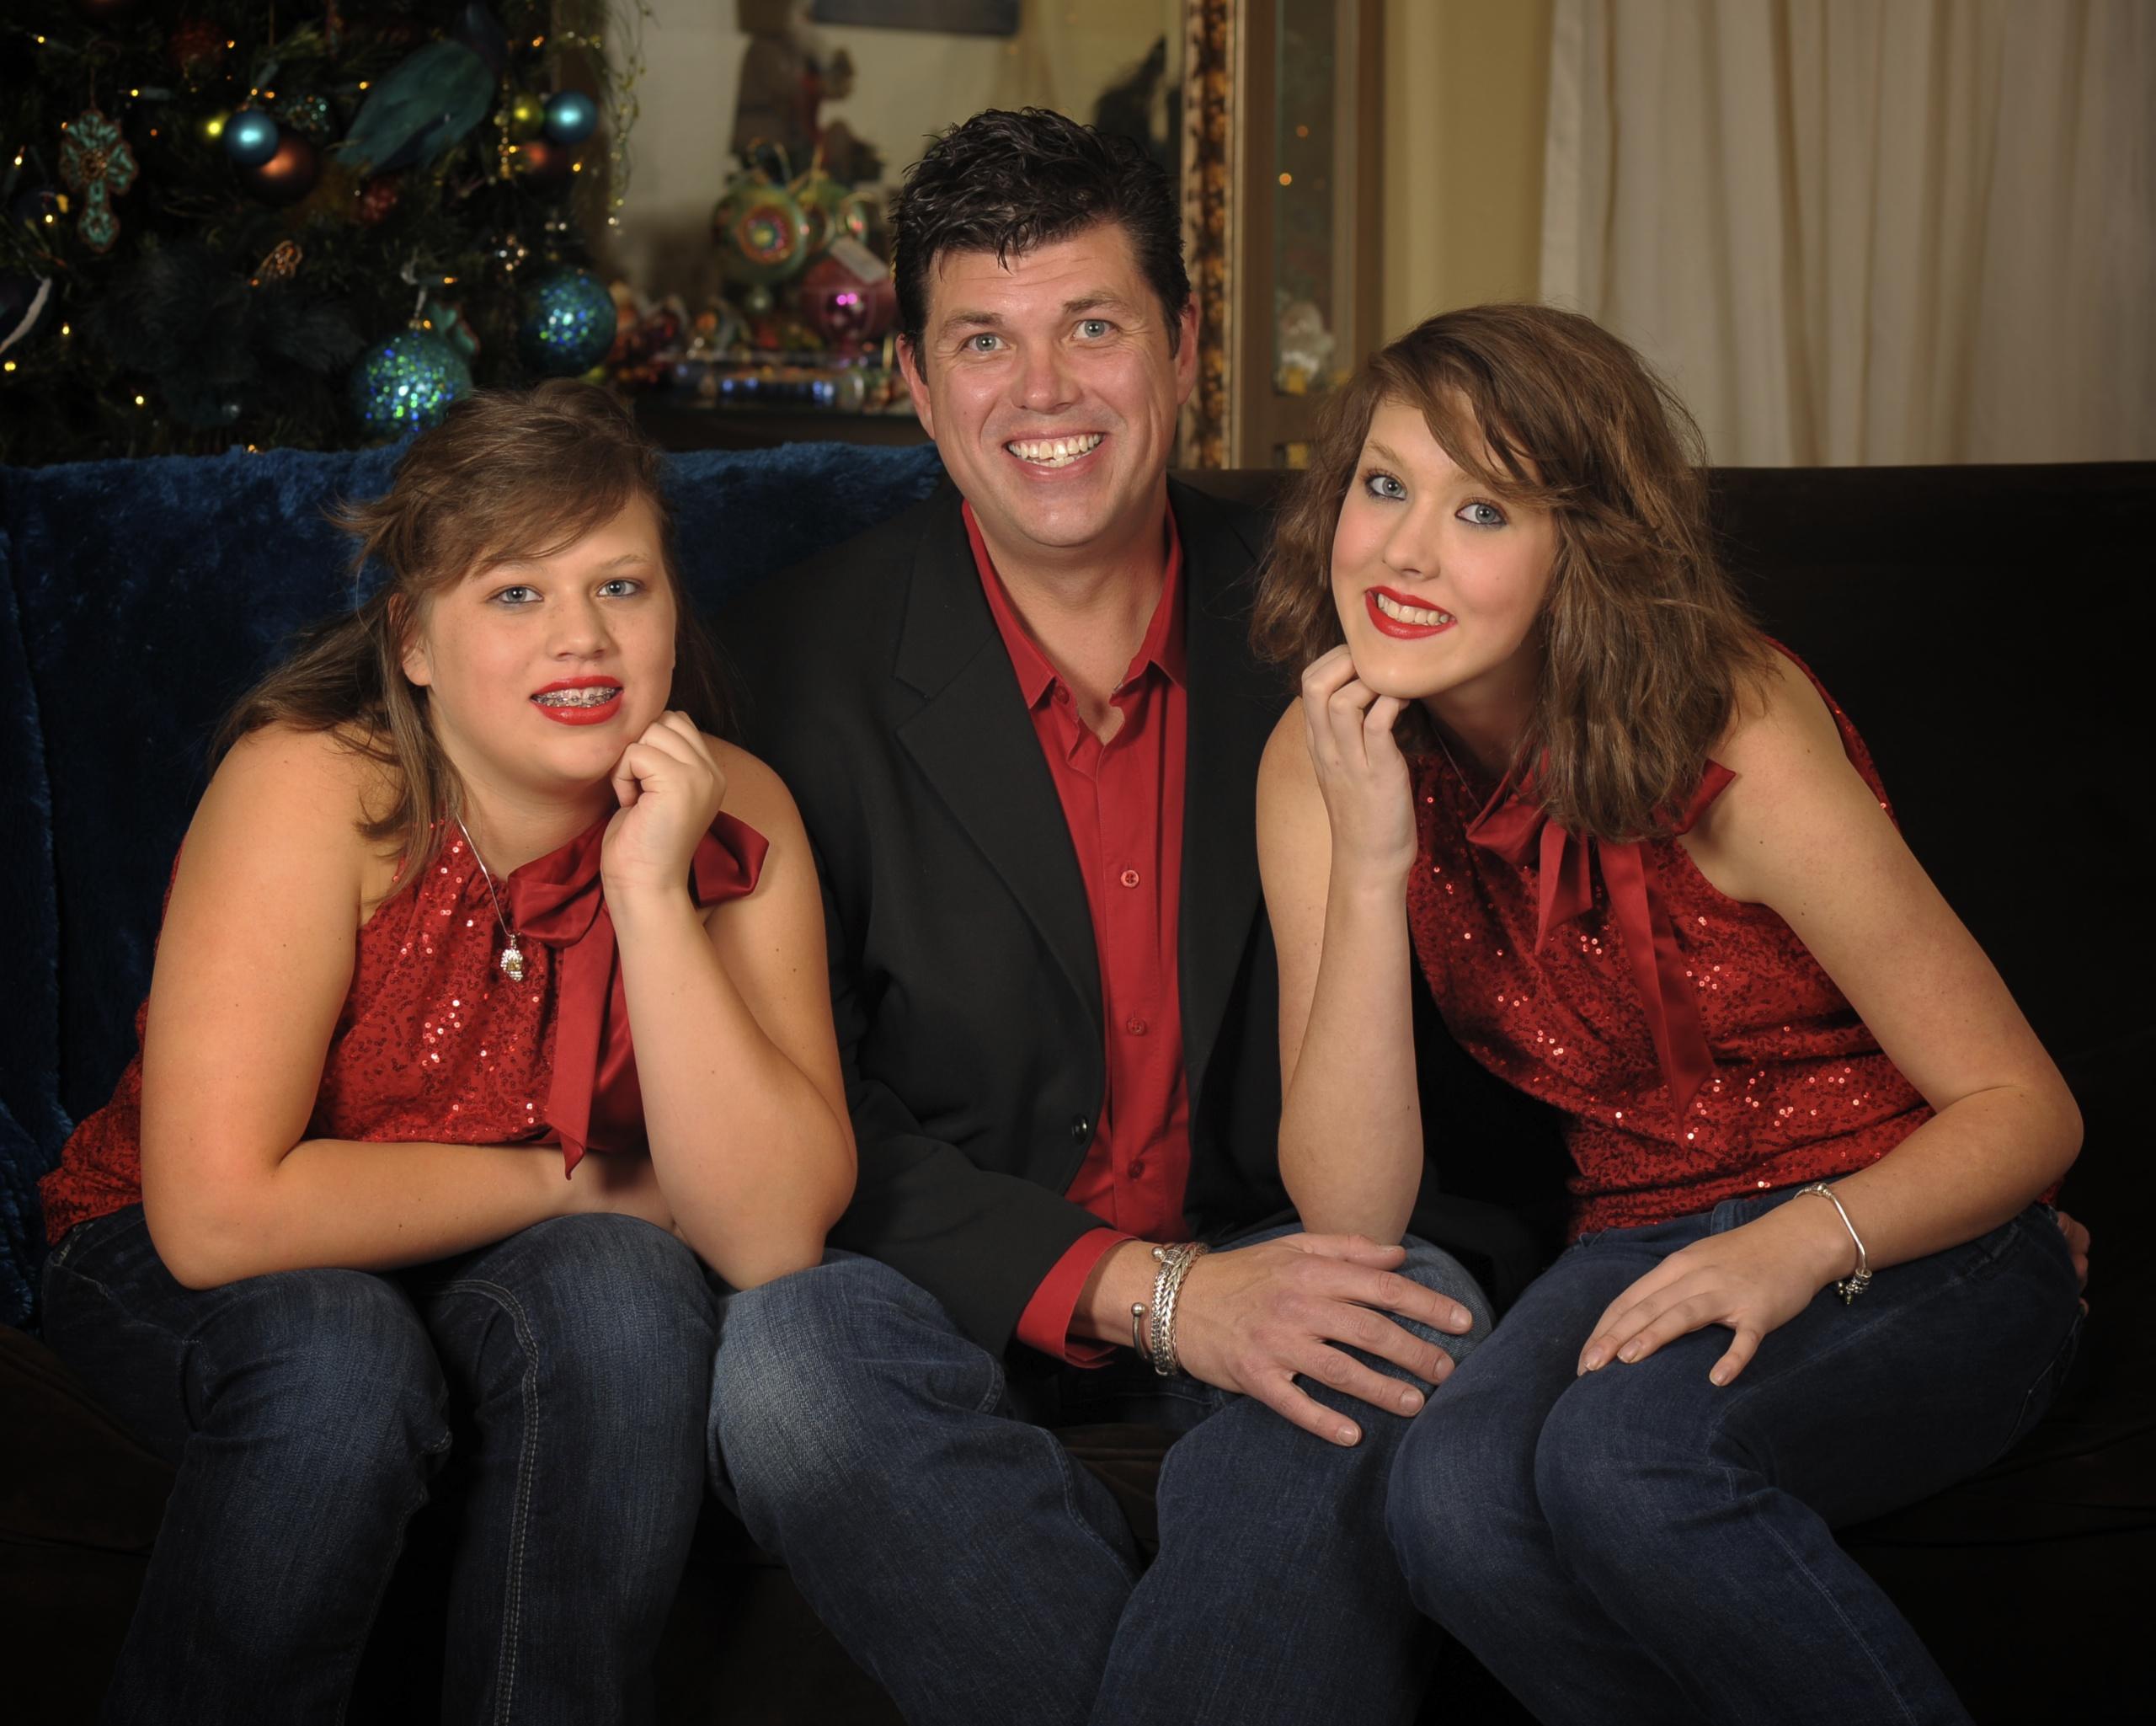 Frye Family Portrait